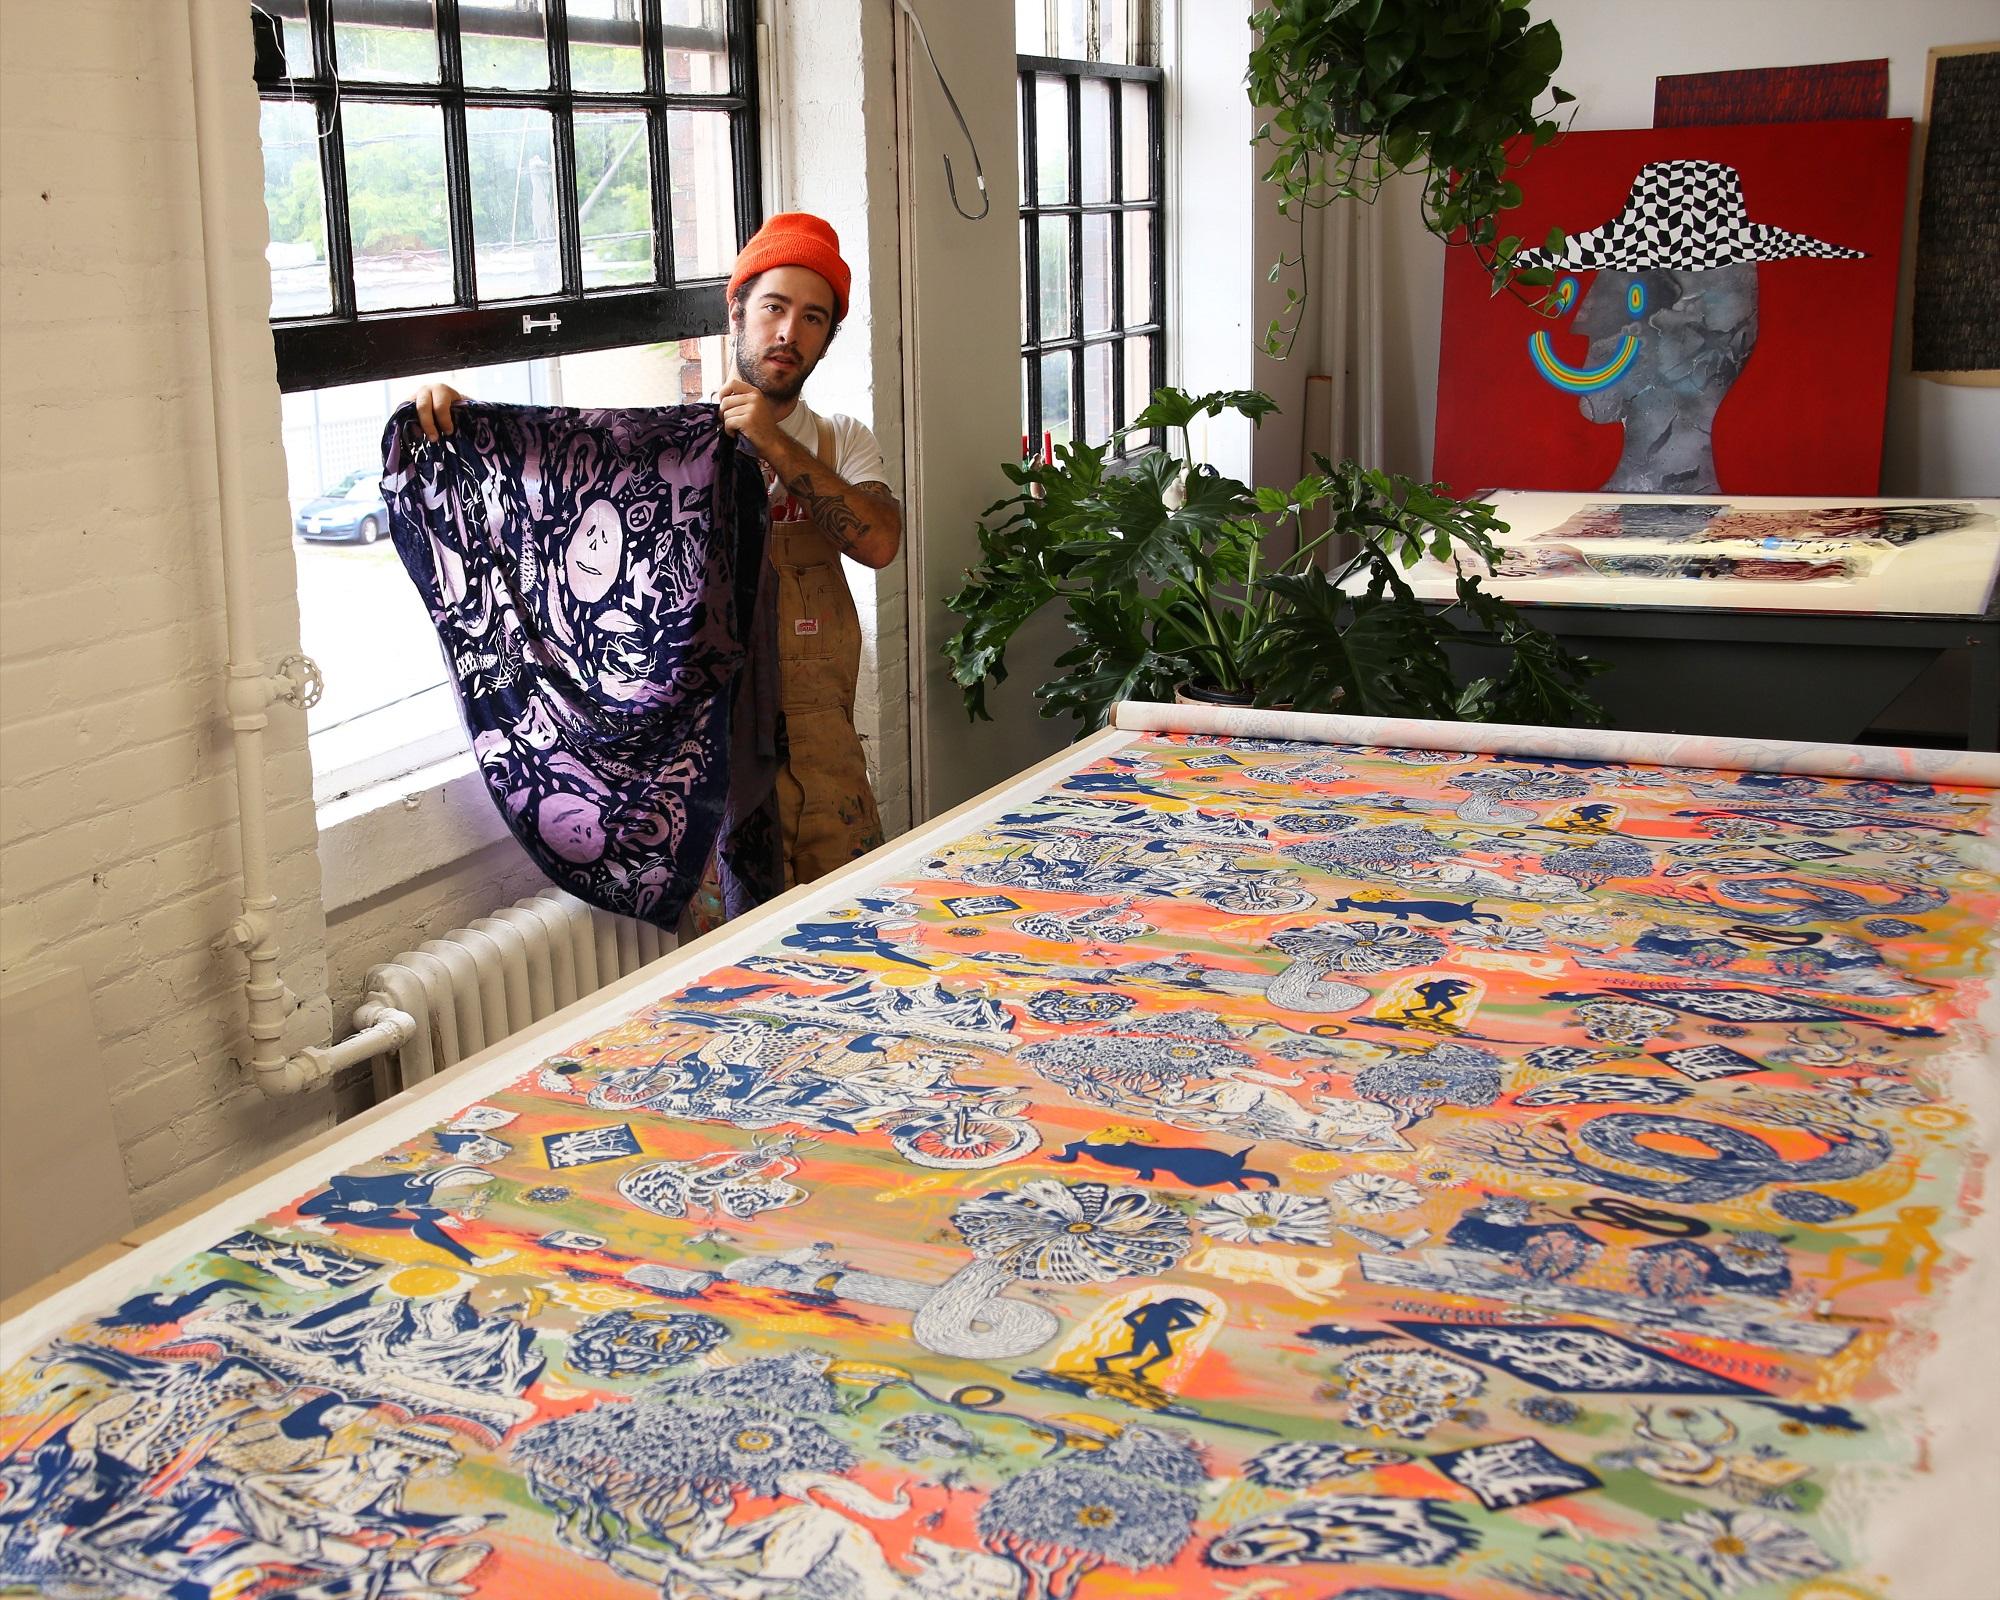 Dan Bortz textiles